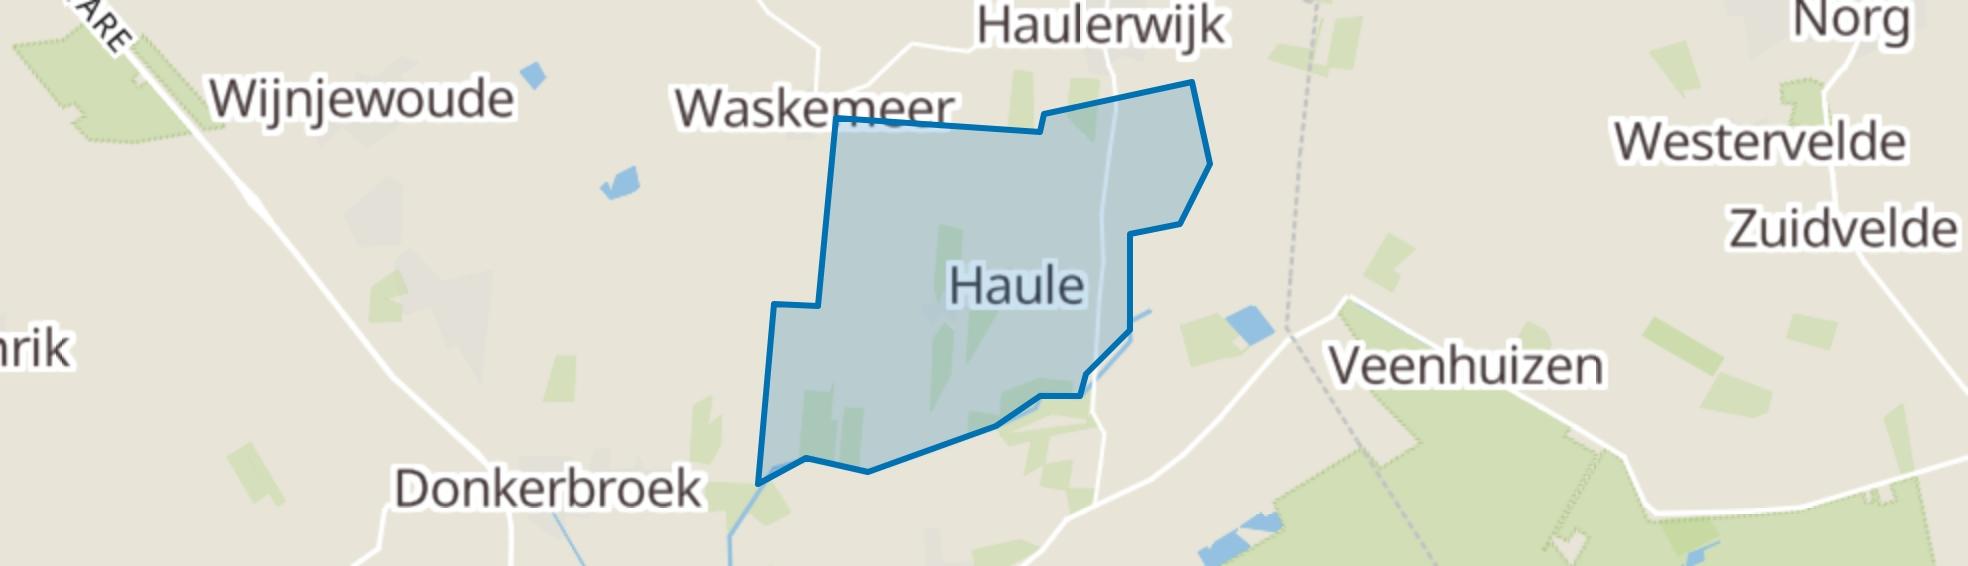 Haule map